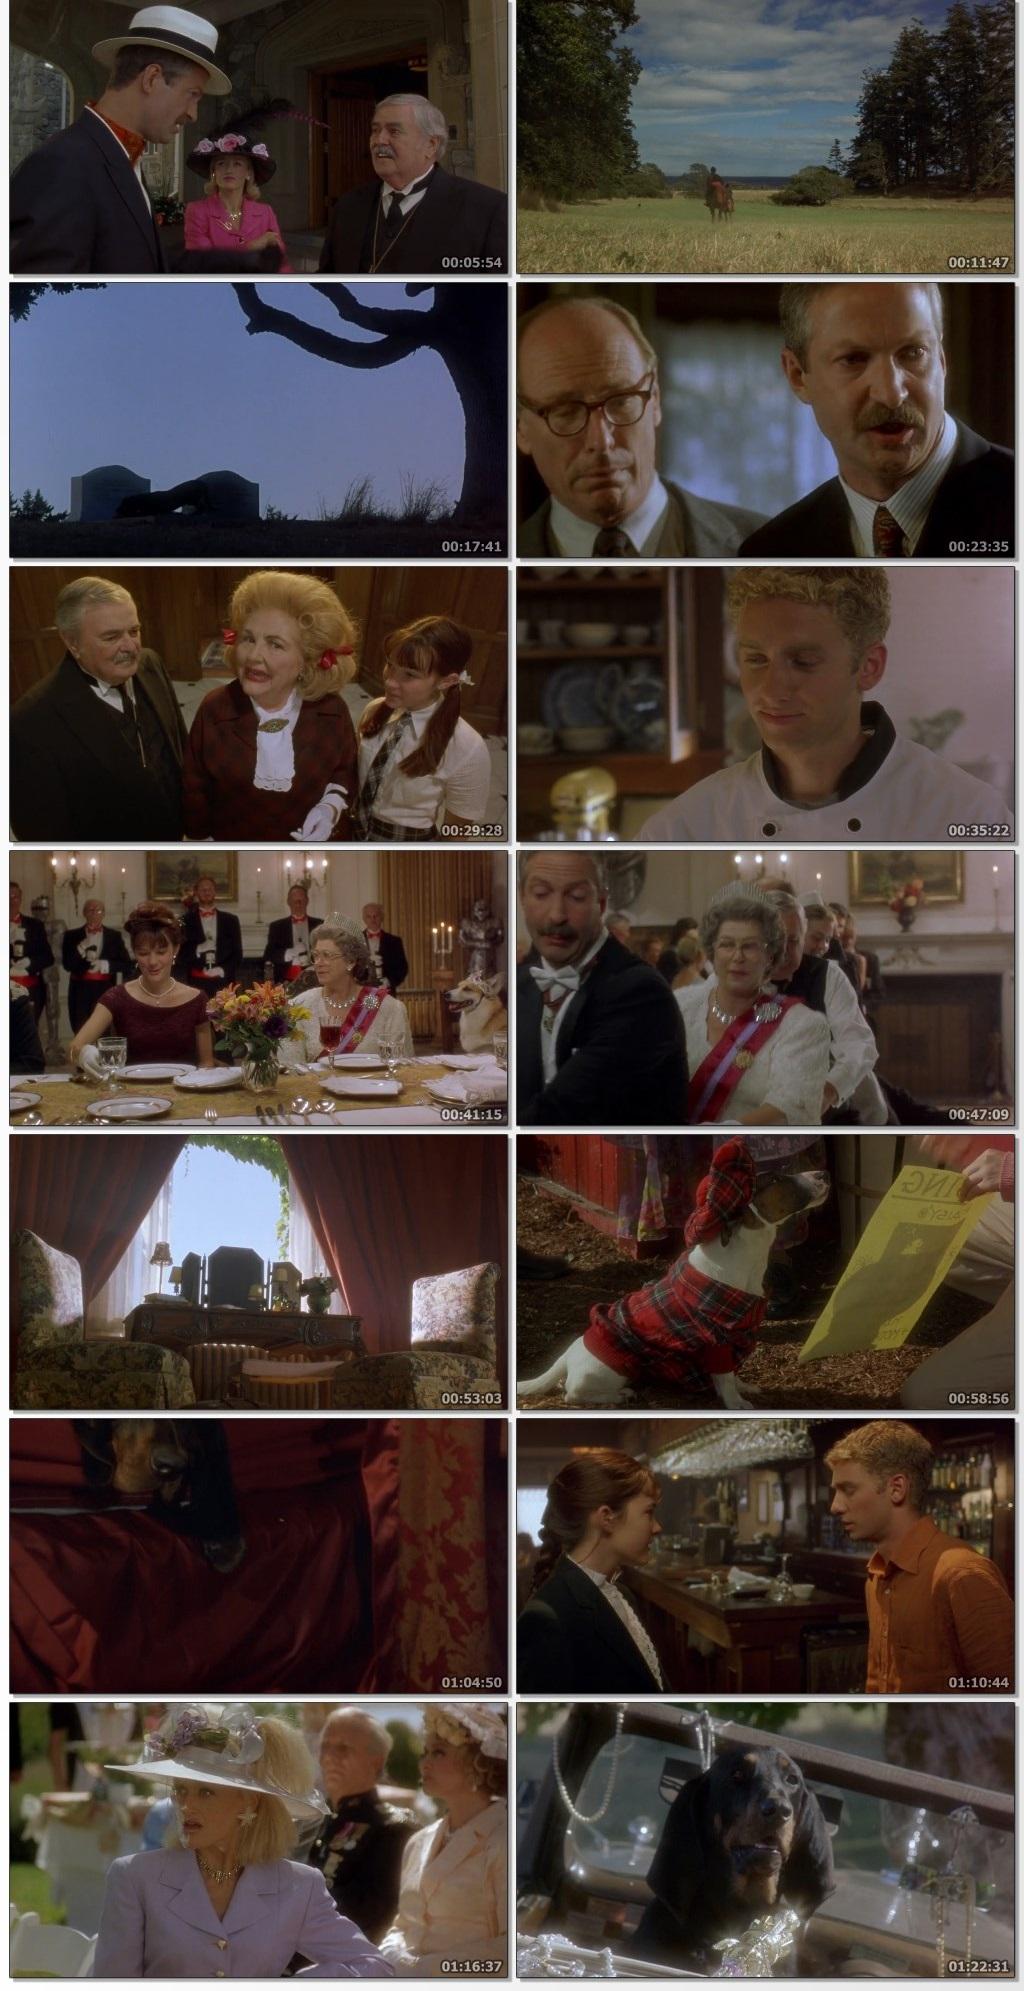 The-Duke-1999-www-9kmovies-cool-Hindi-Dual-Audio-720p-HDRip-800-MB-mkv-thumbs